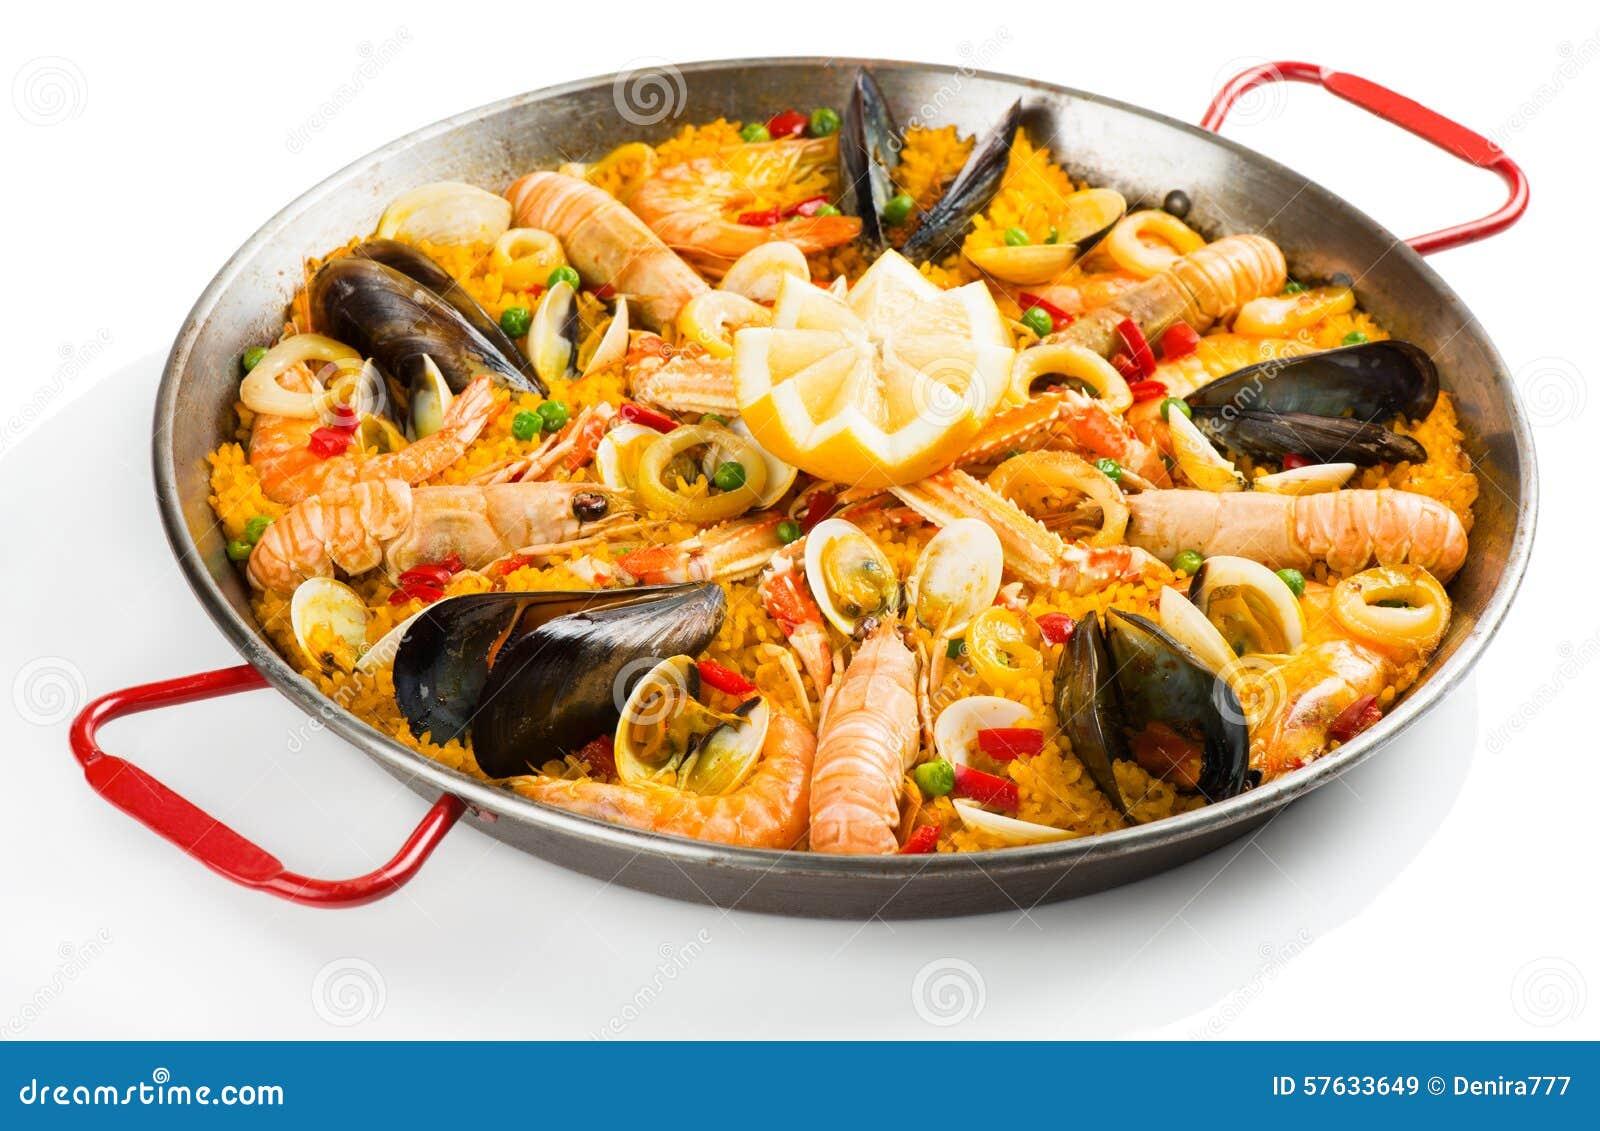 paella espagnole avec des fruits de mer photo stock image 57633649. Black Bedroom Furniture Sets. Home Design Ideas